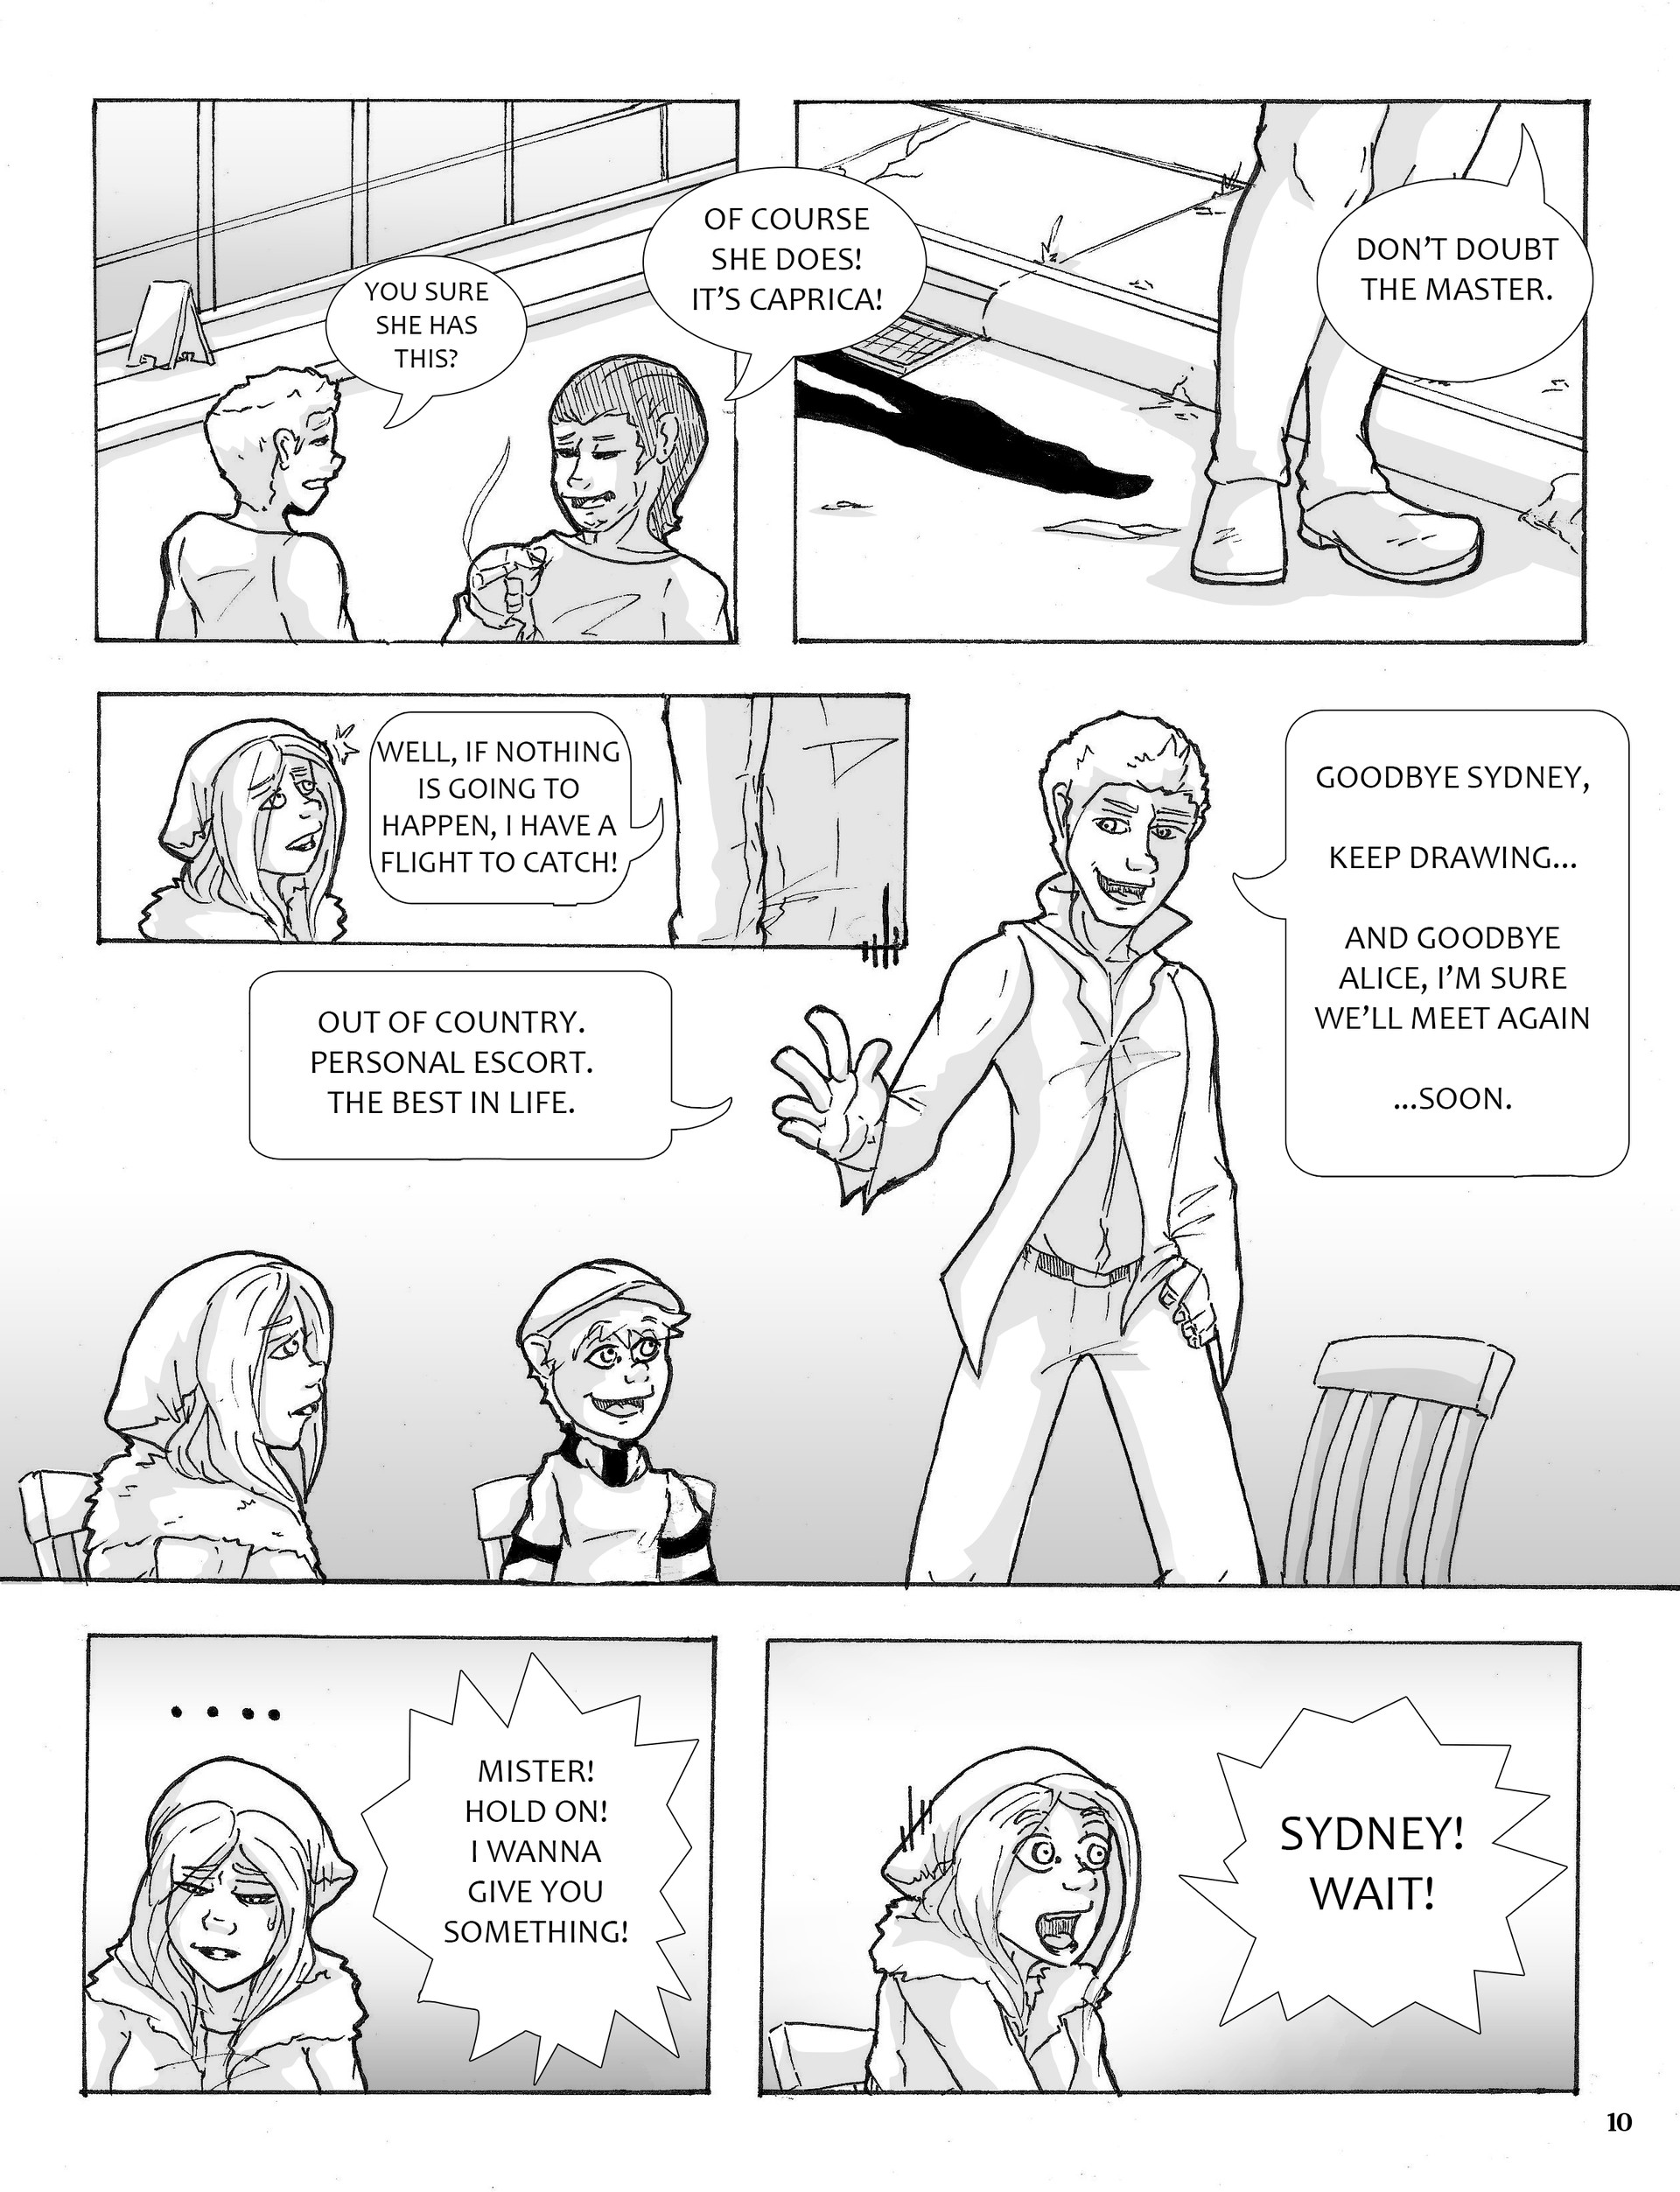 Detonya kan page10